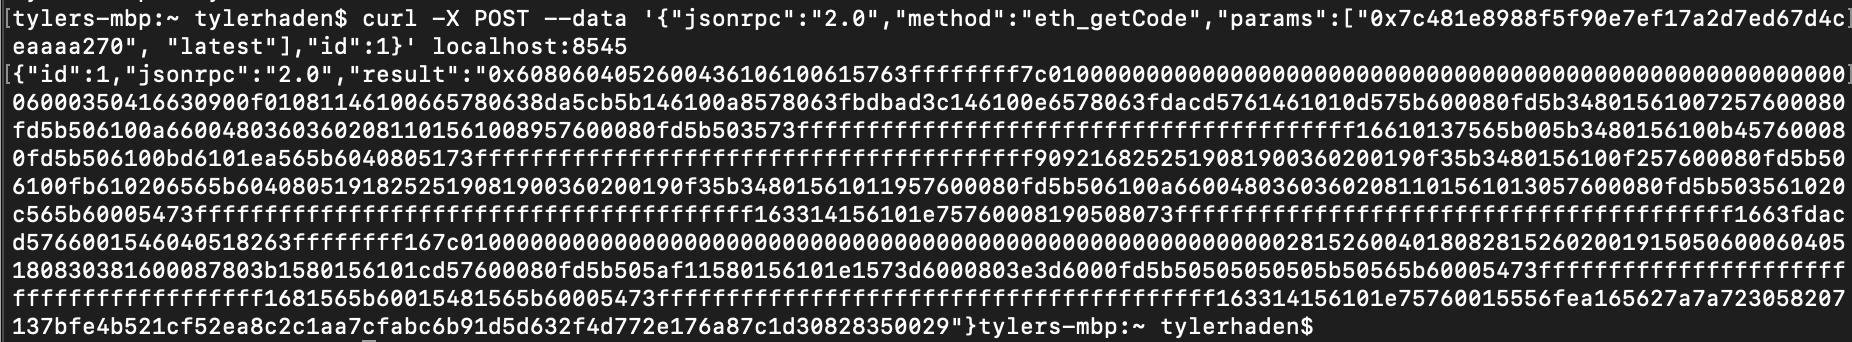 Ganache cli getCode (pic missing)